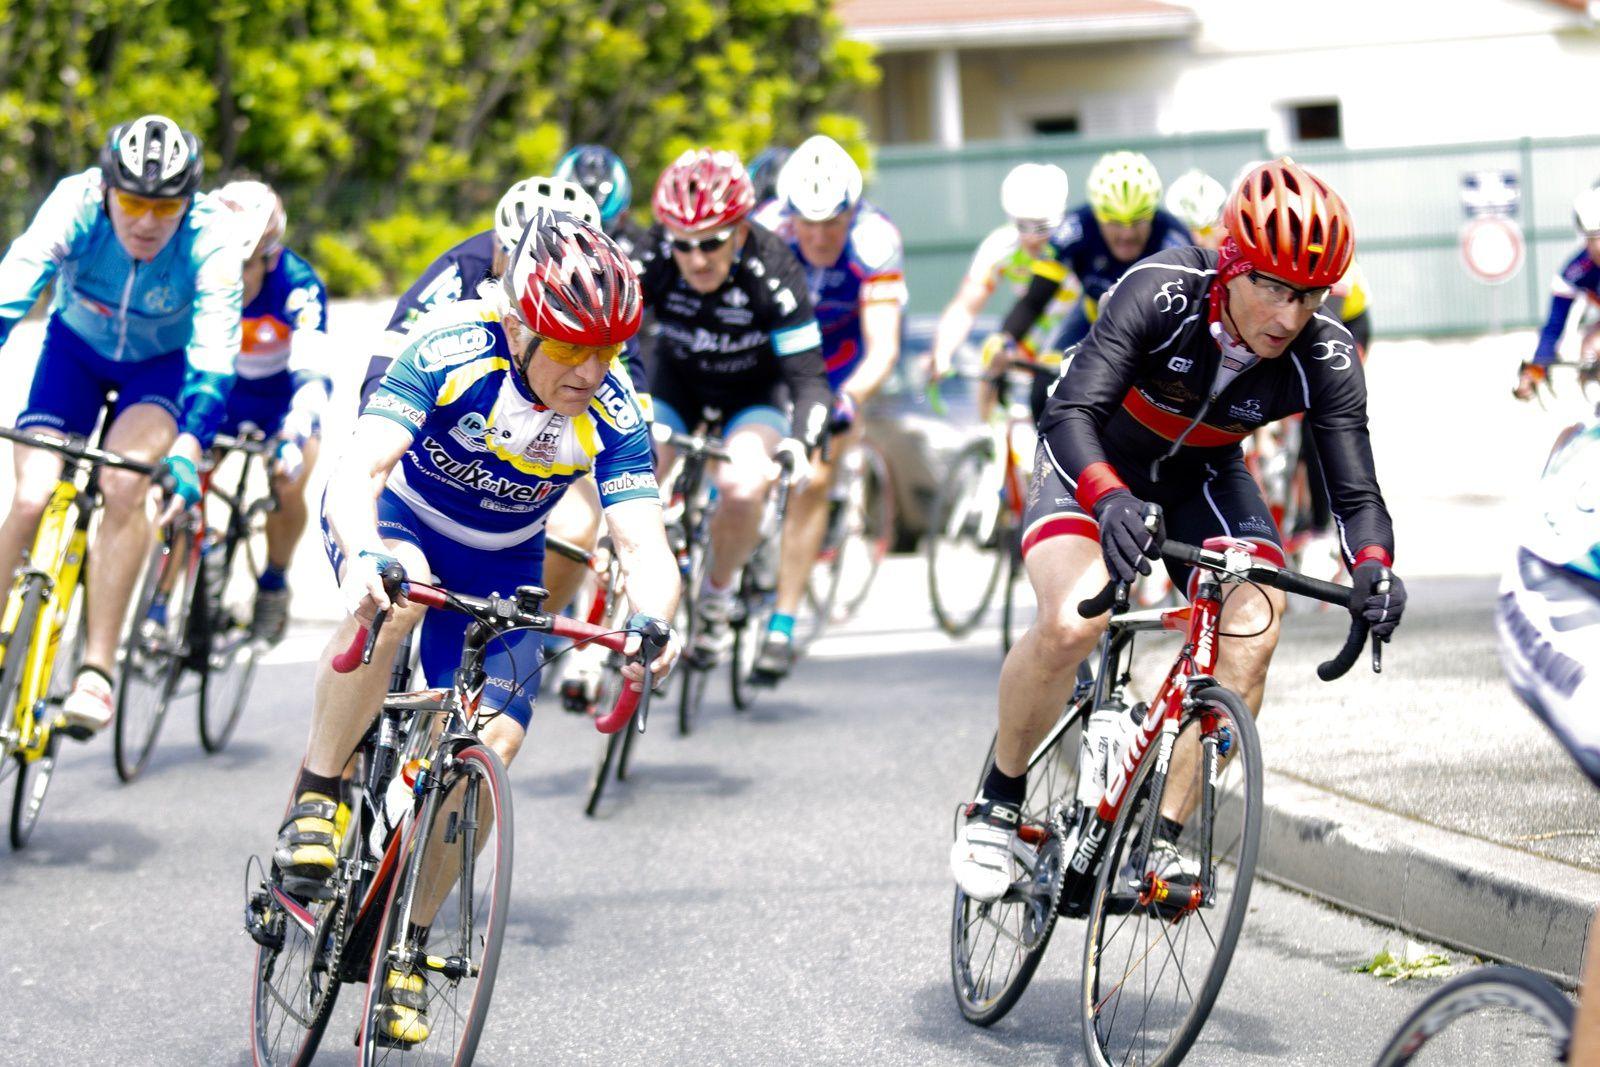 Le Grand Prix Cycliste Dalkia - Marcel Houël du VCMB a tenu toutes ses promesses